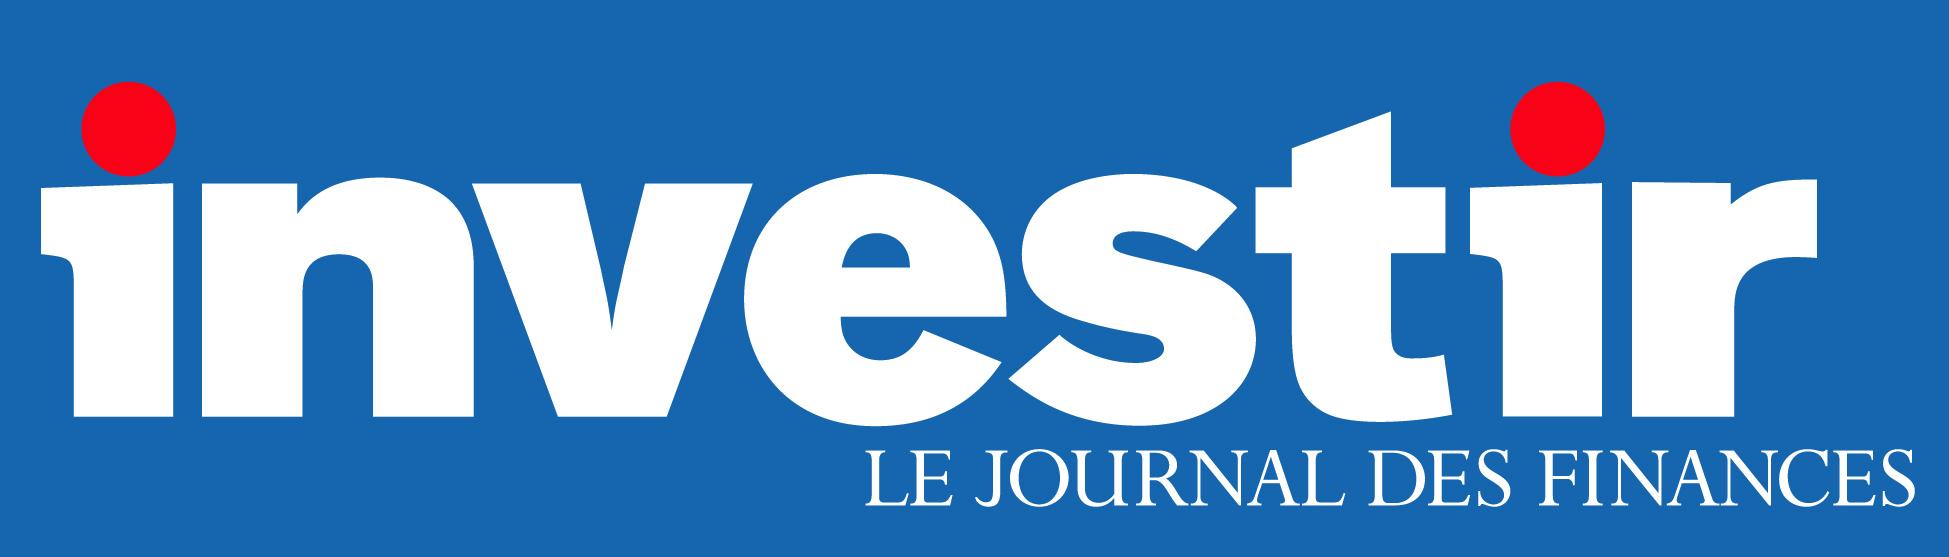 investir.lesechos.fr